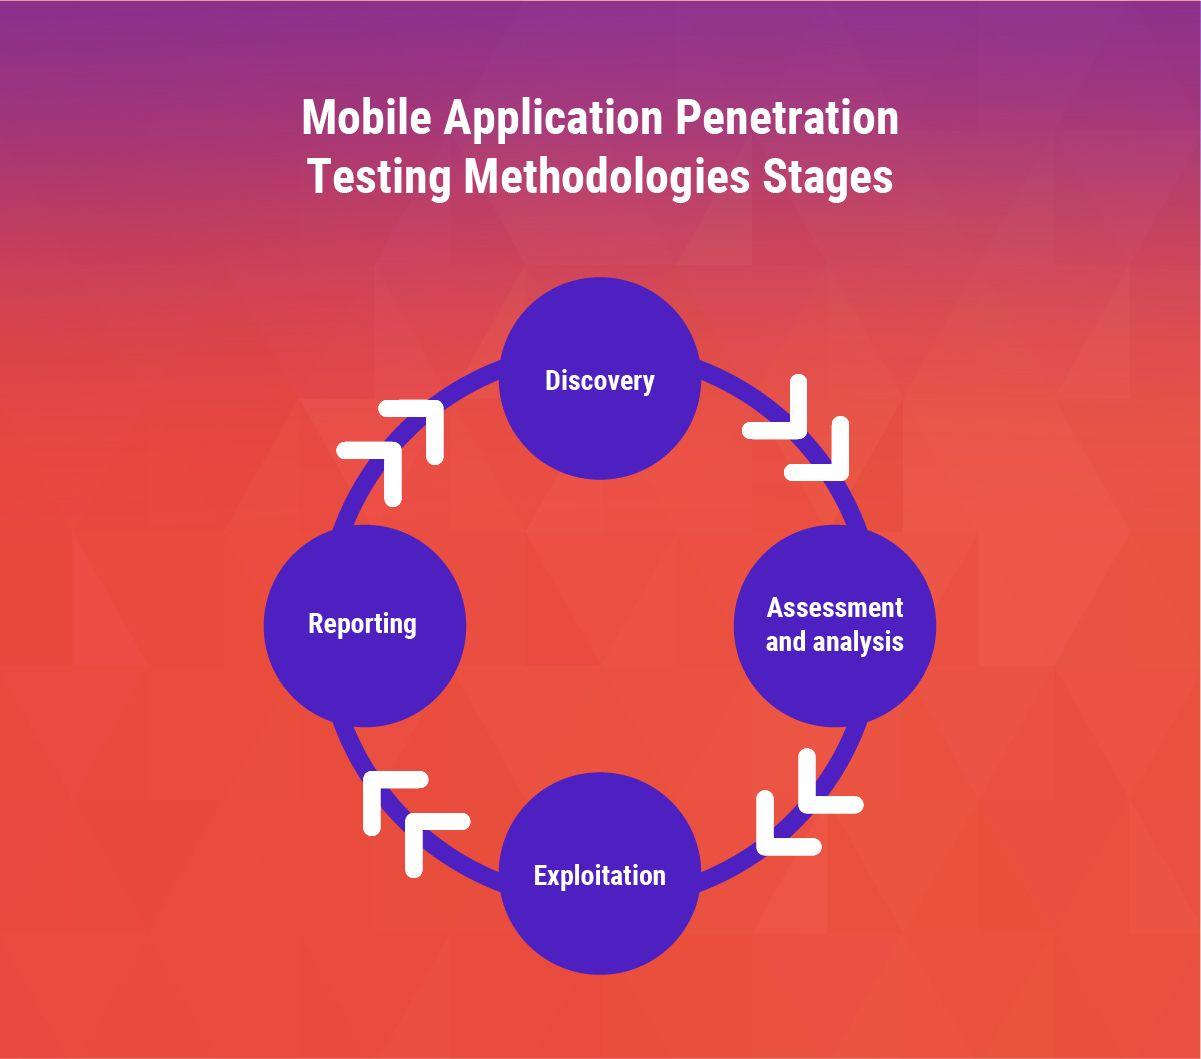 Mobile Application Penetration Testing Methodologies Stages